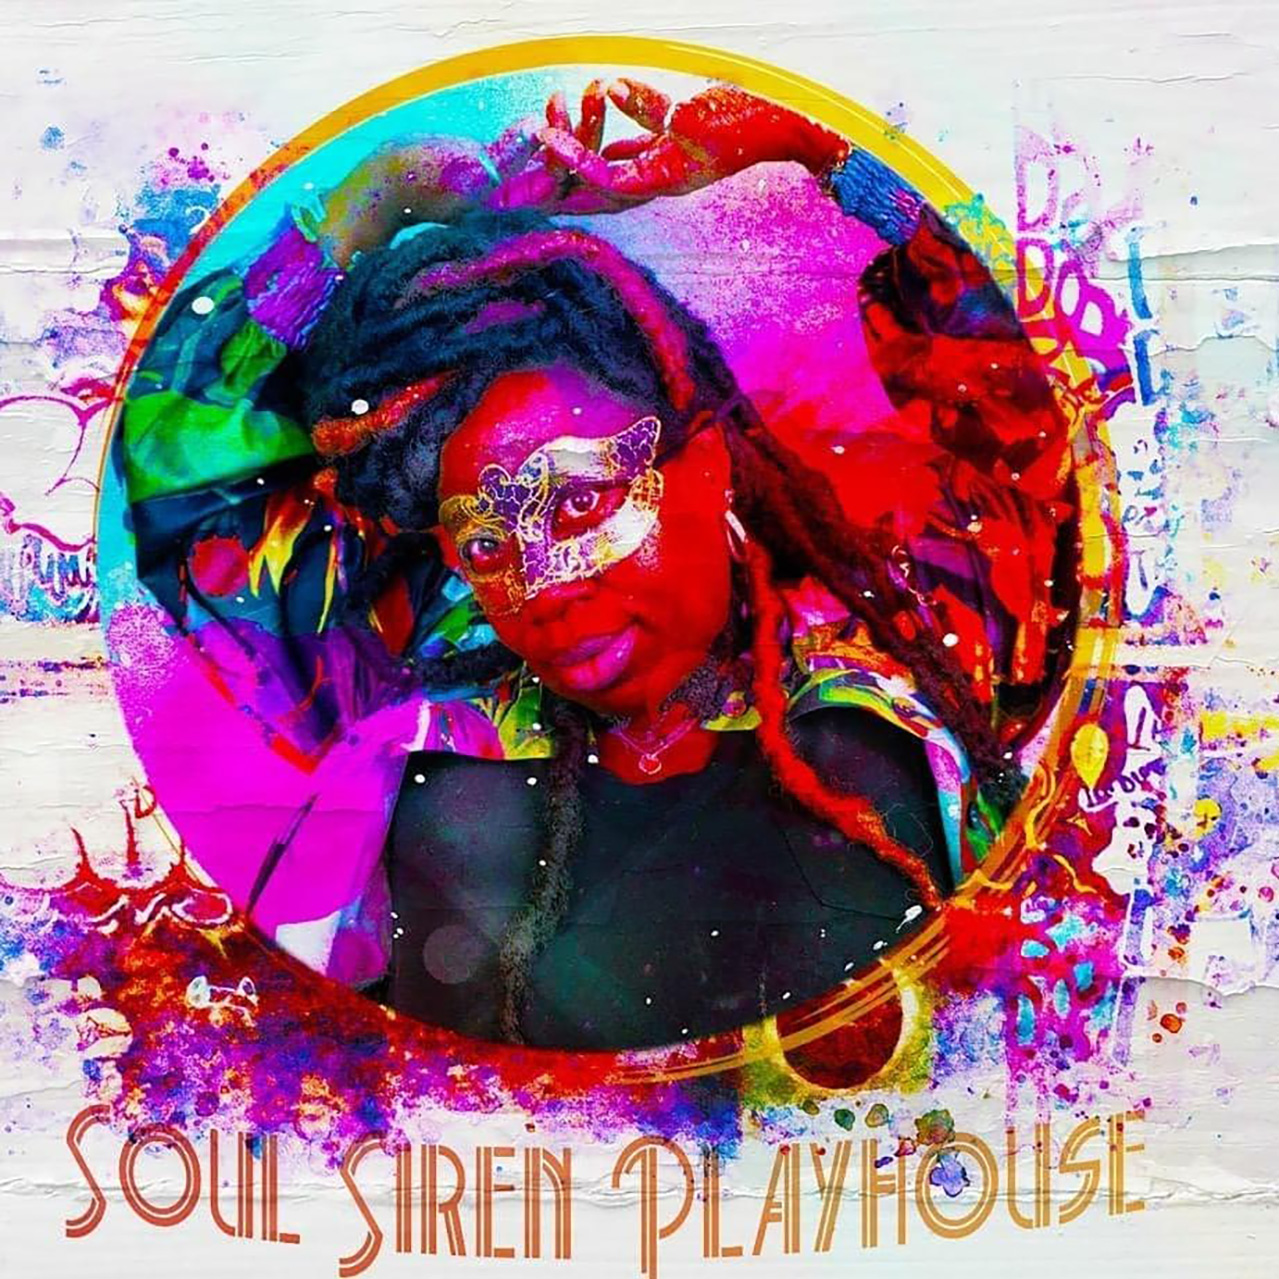 Soul Siren is Vibrant